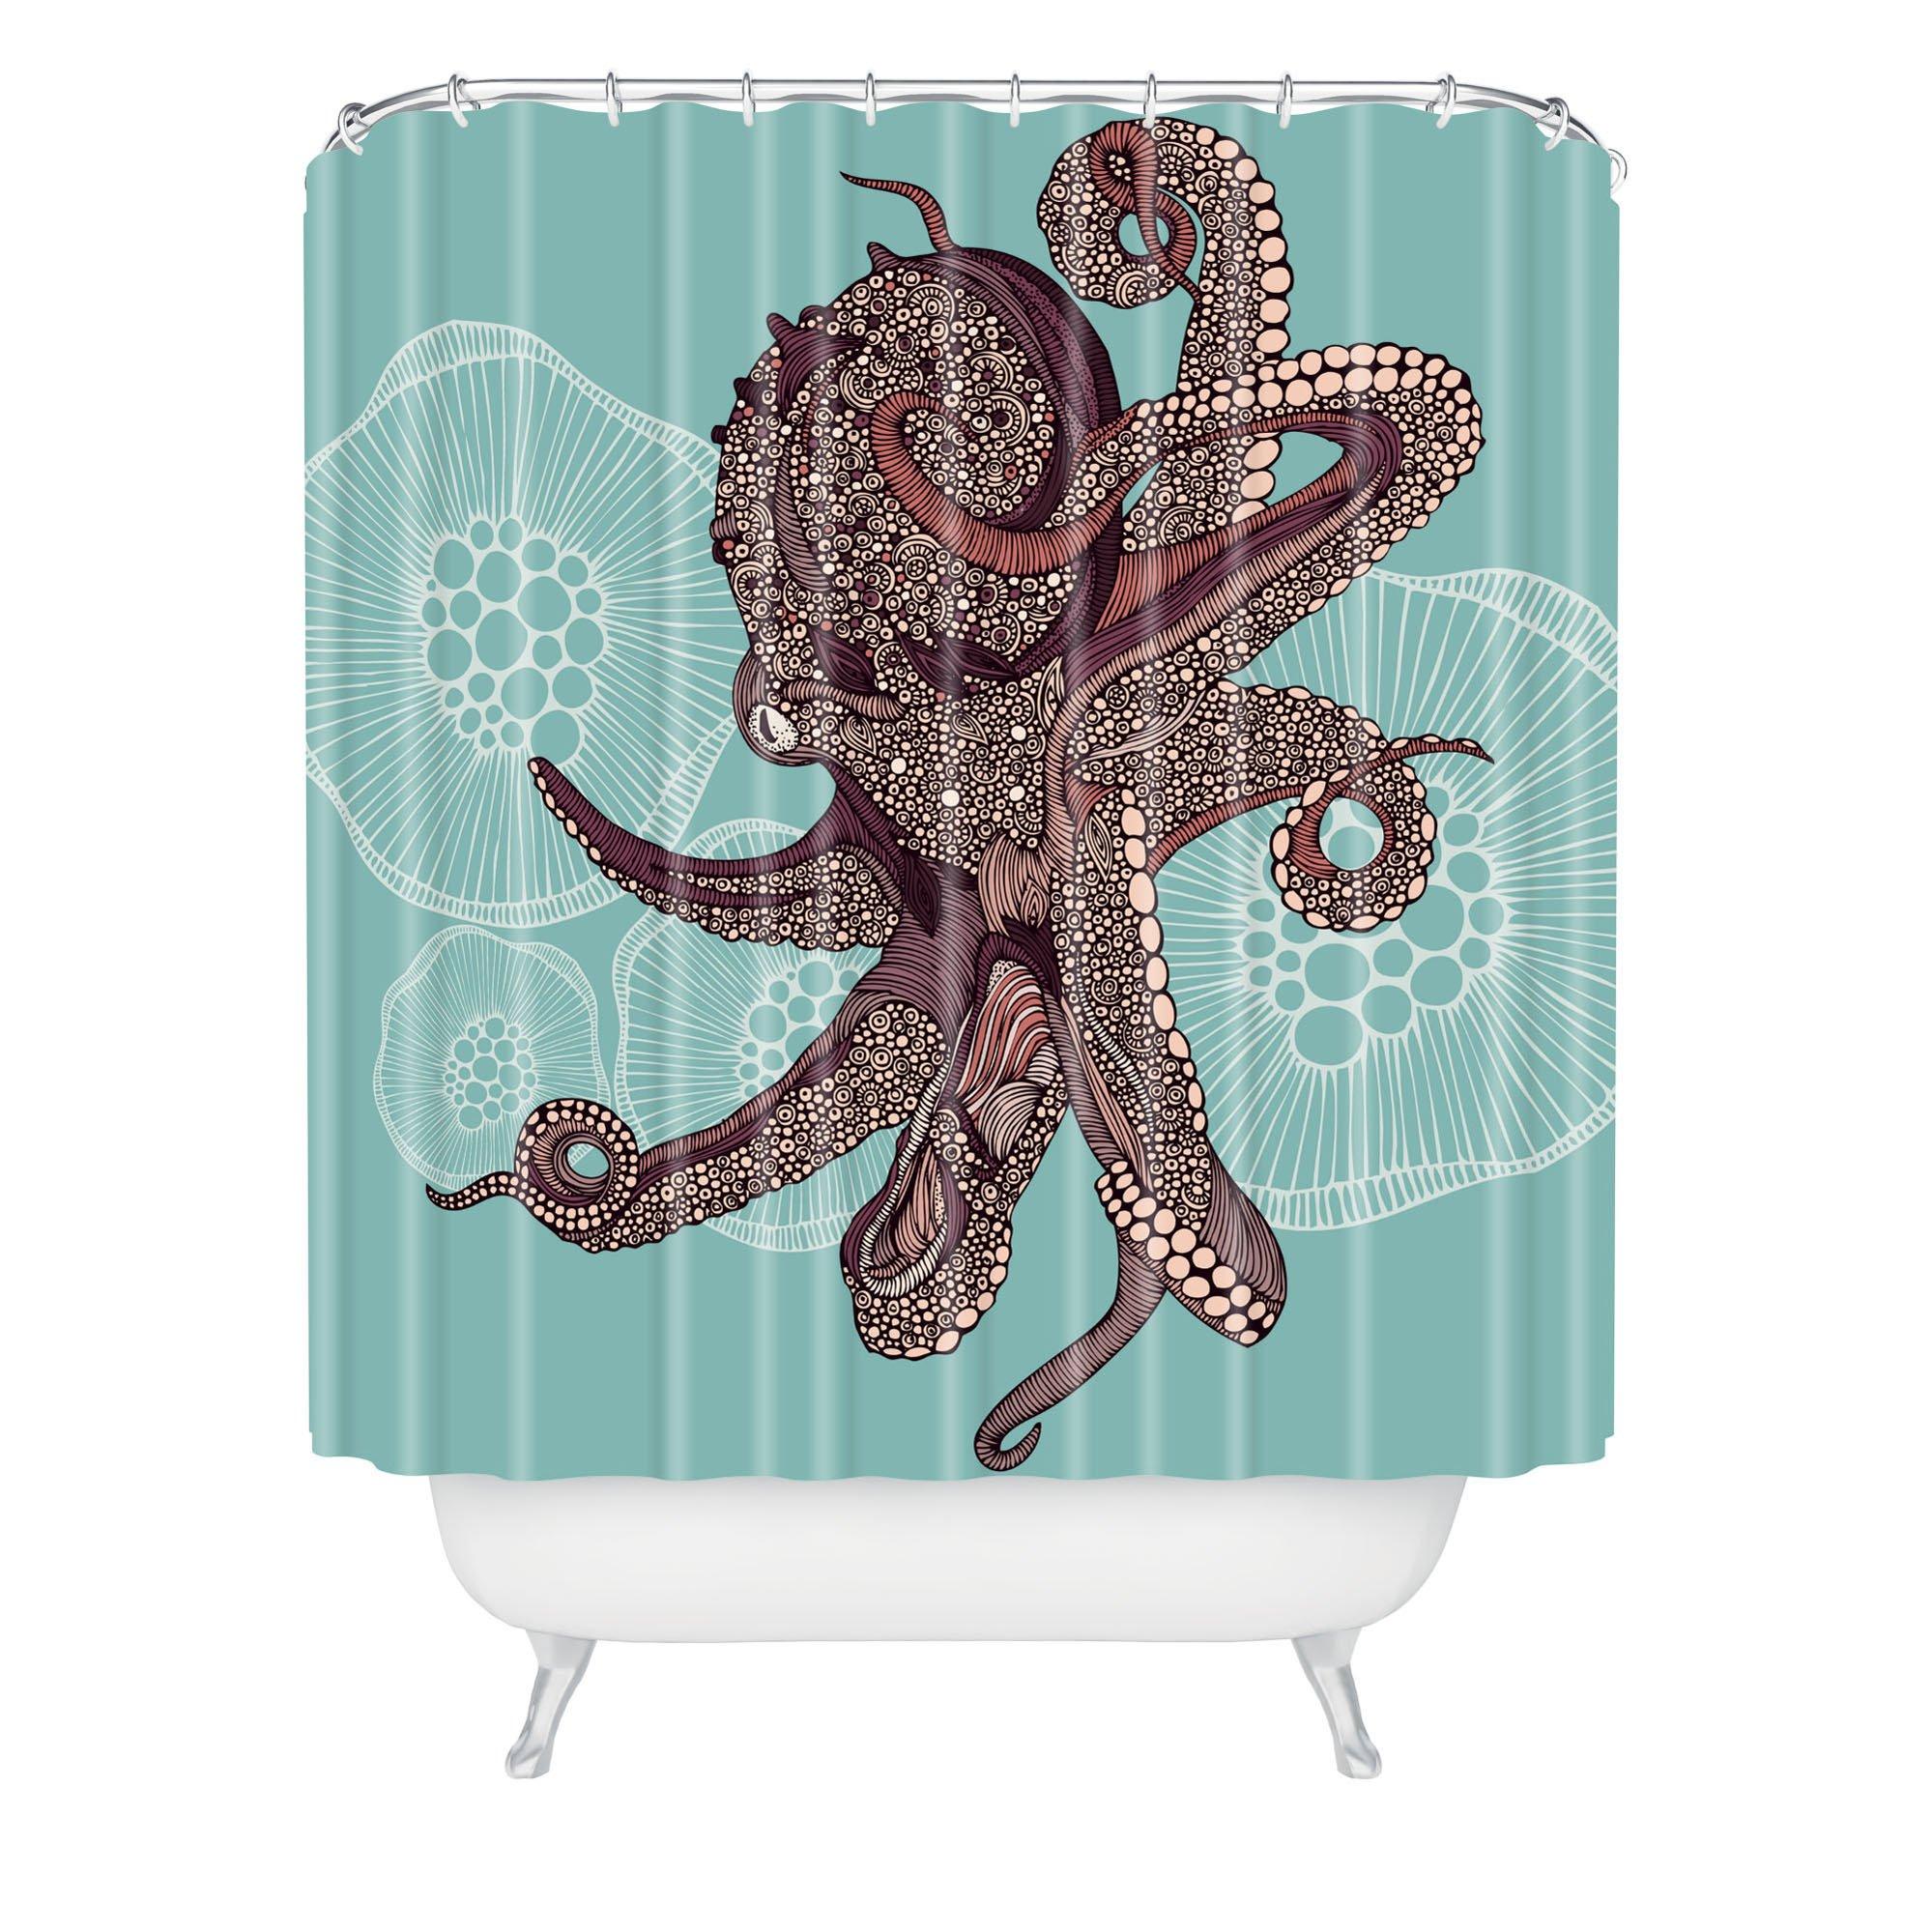 Deny Designs Valentina Ramos Octopus Bloom Shower Curtain Extra Long, 69 x 90